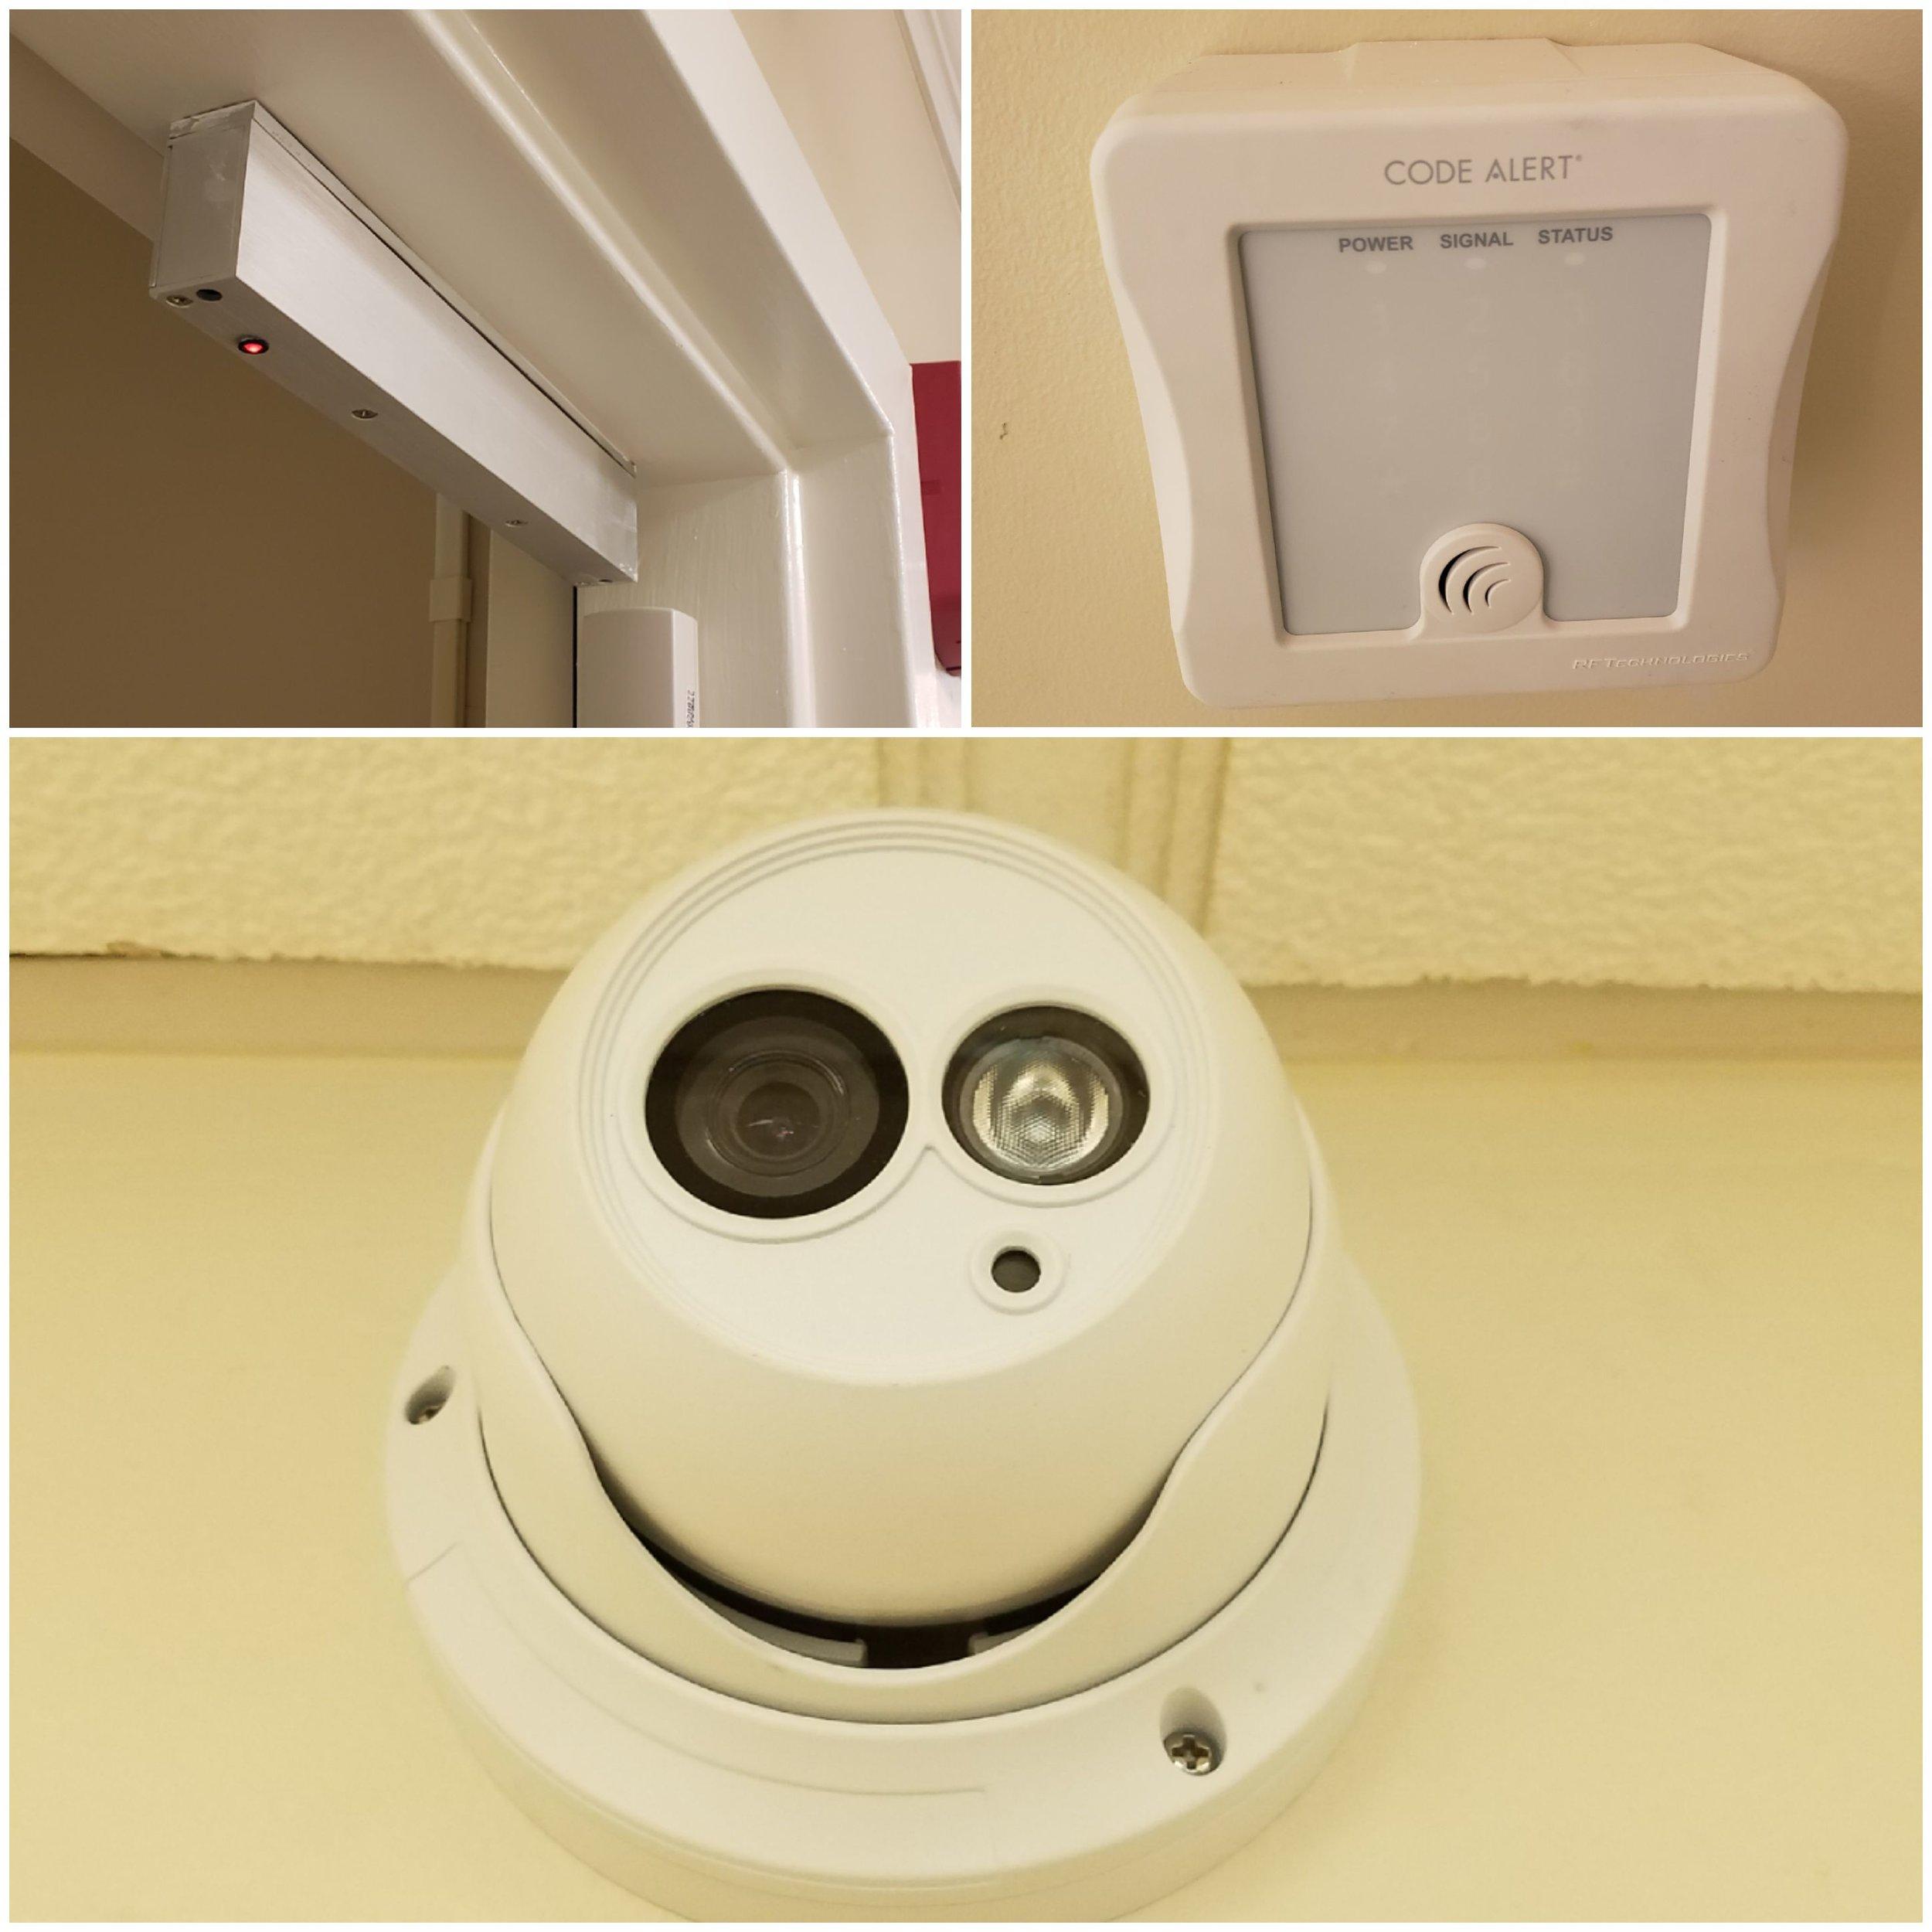 lntech-security-camera-installation-access-control.jpg